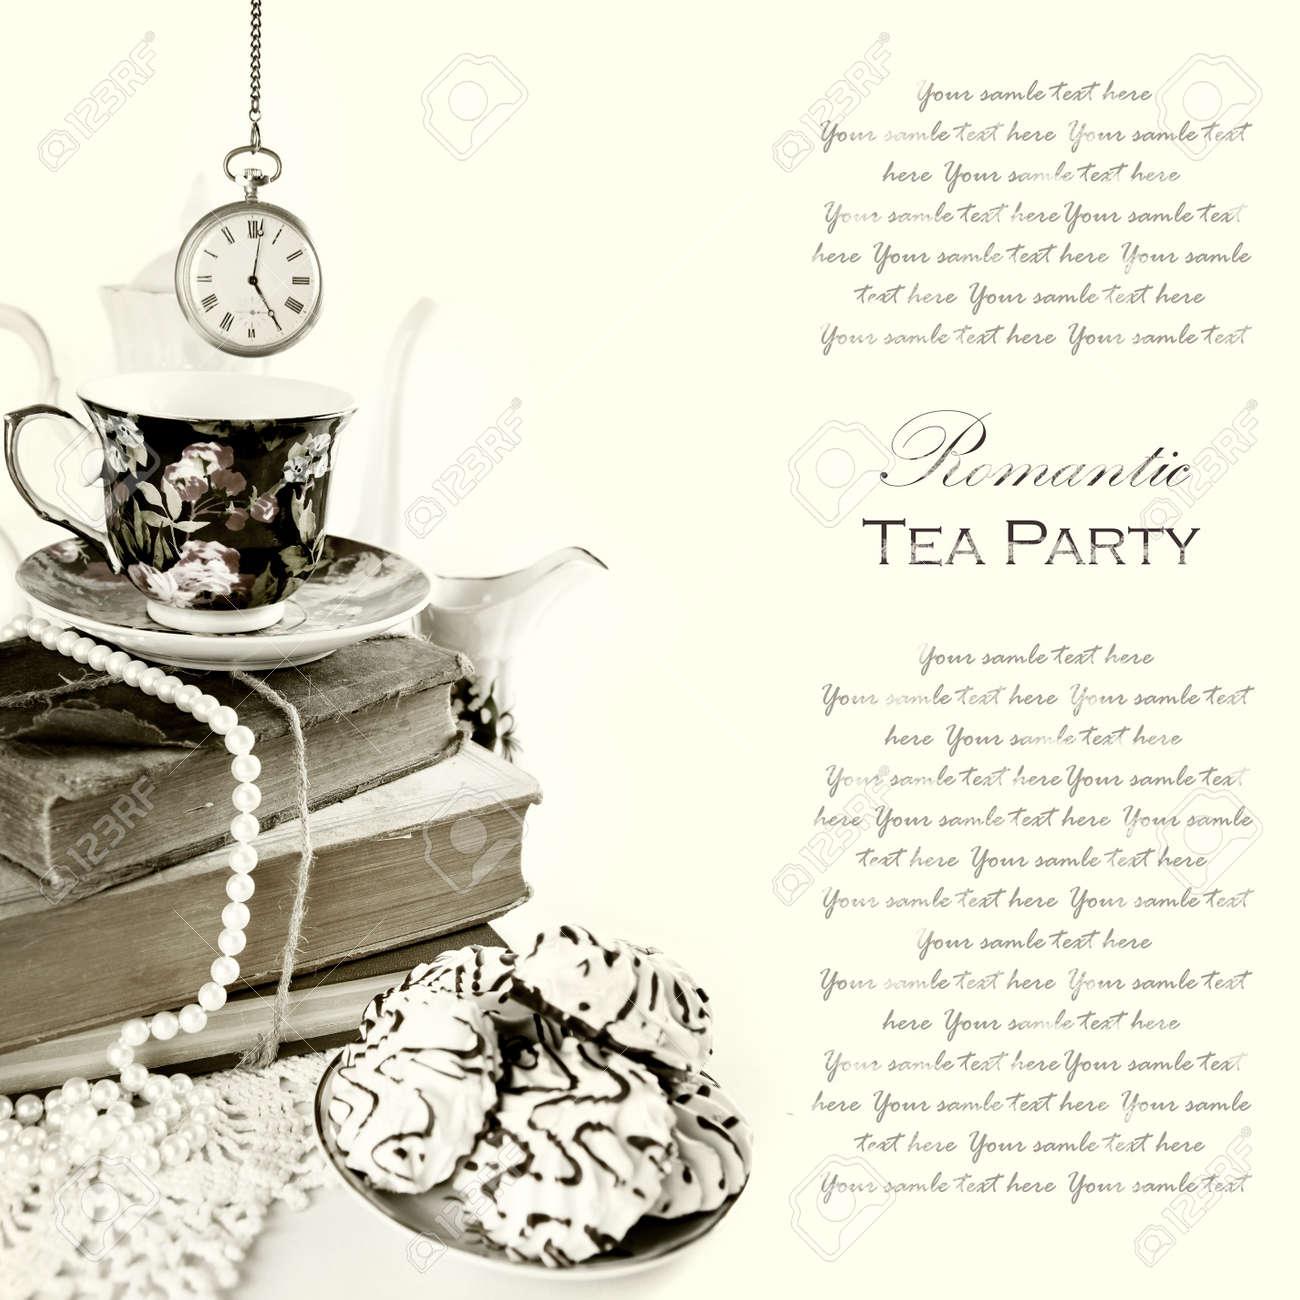 Tea party background royalty free stock photo image 28839215 - Jpg 1300x1300 English Tea Party Background